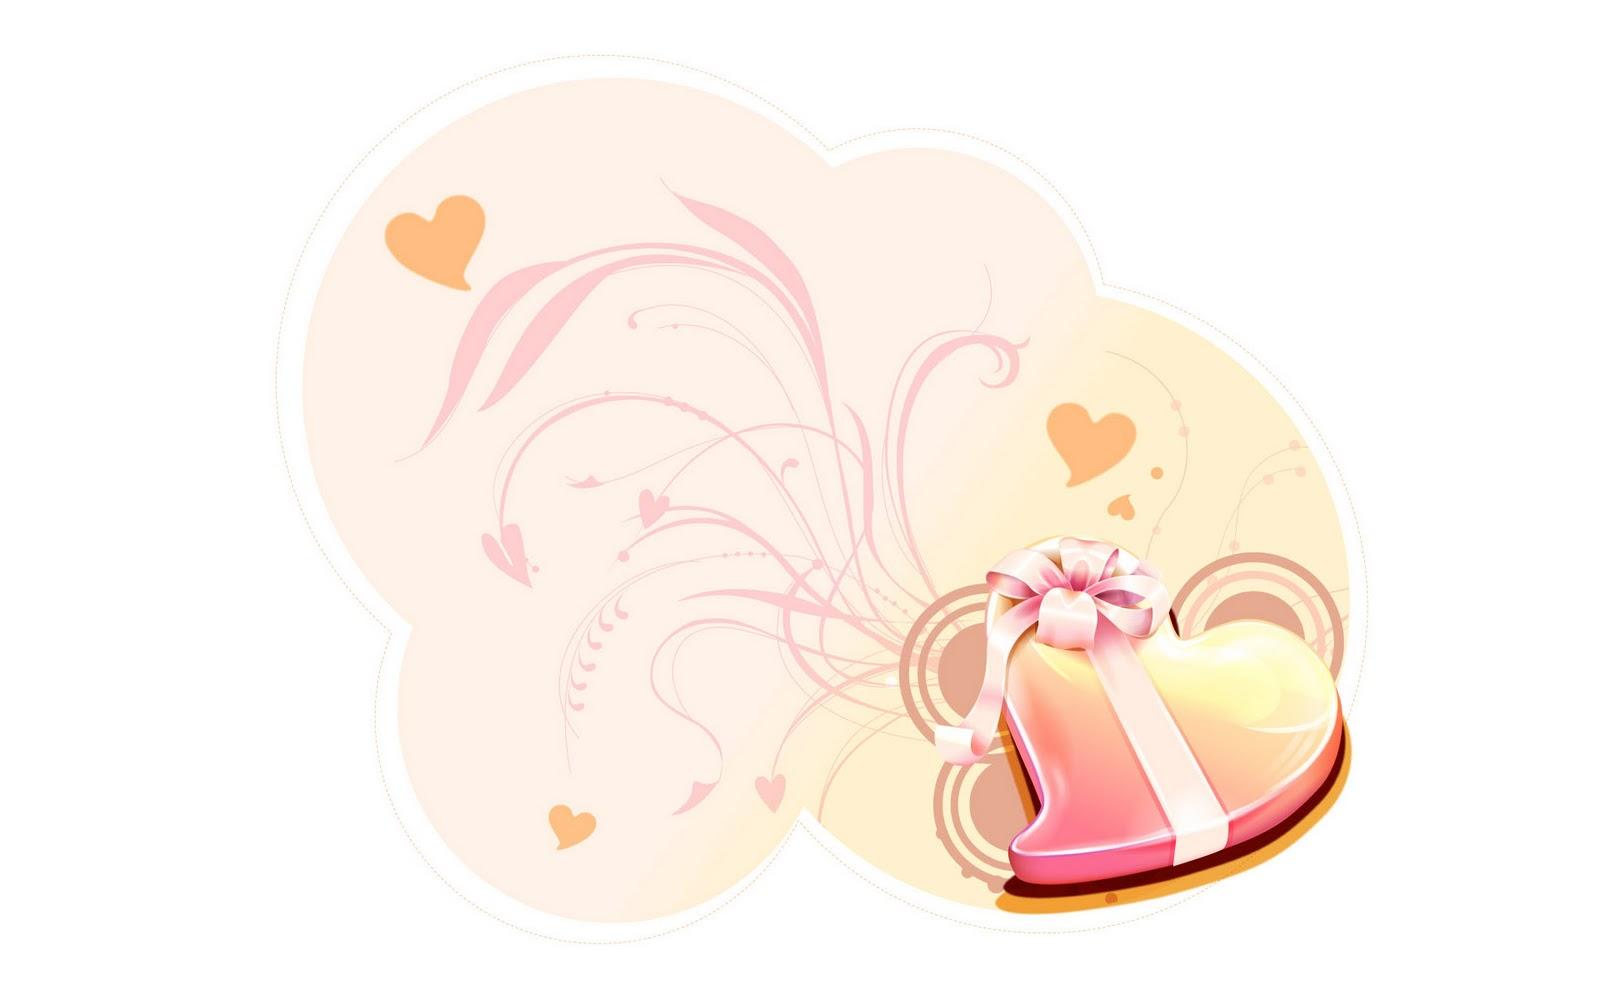 http://4.bp.blogspot.com/-foN4UHxGyTU/TtouRXbE0AI/AAAAAAAAA70/l6M-IJIdCUI/s1600/facebook+heart+wallpapers.jpg